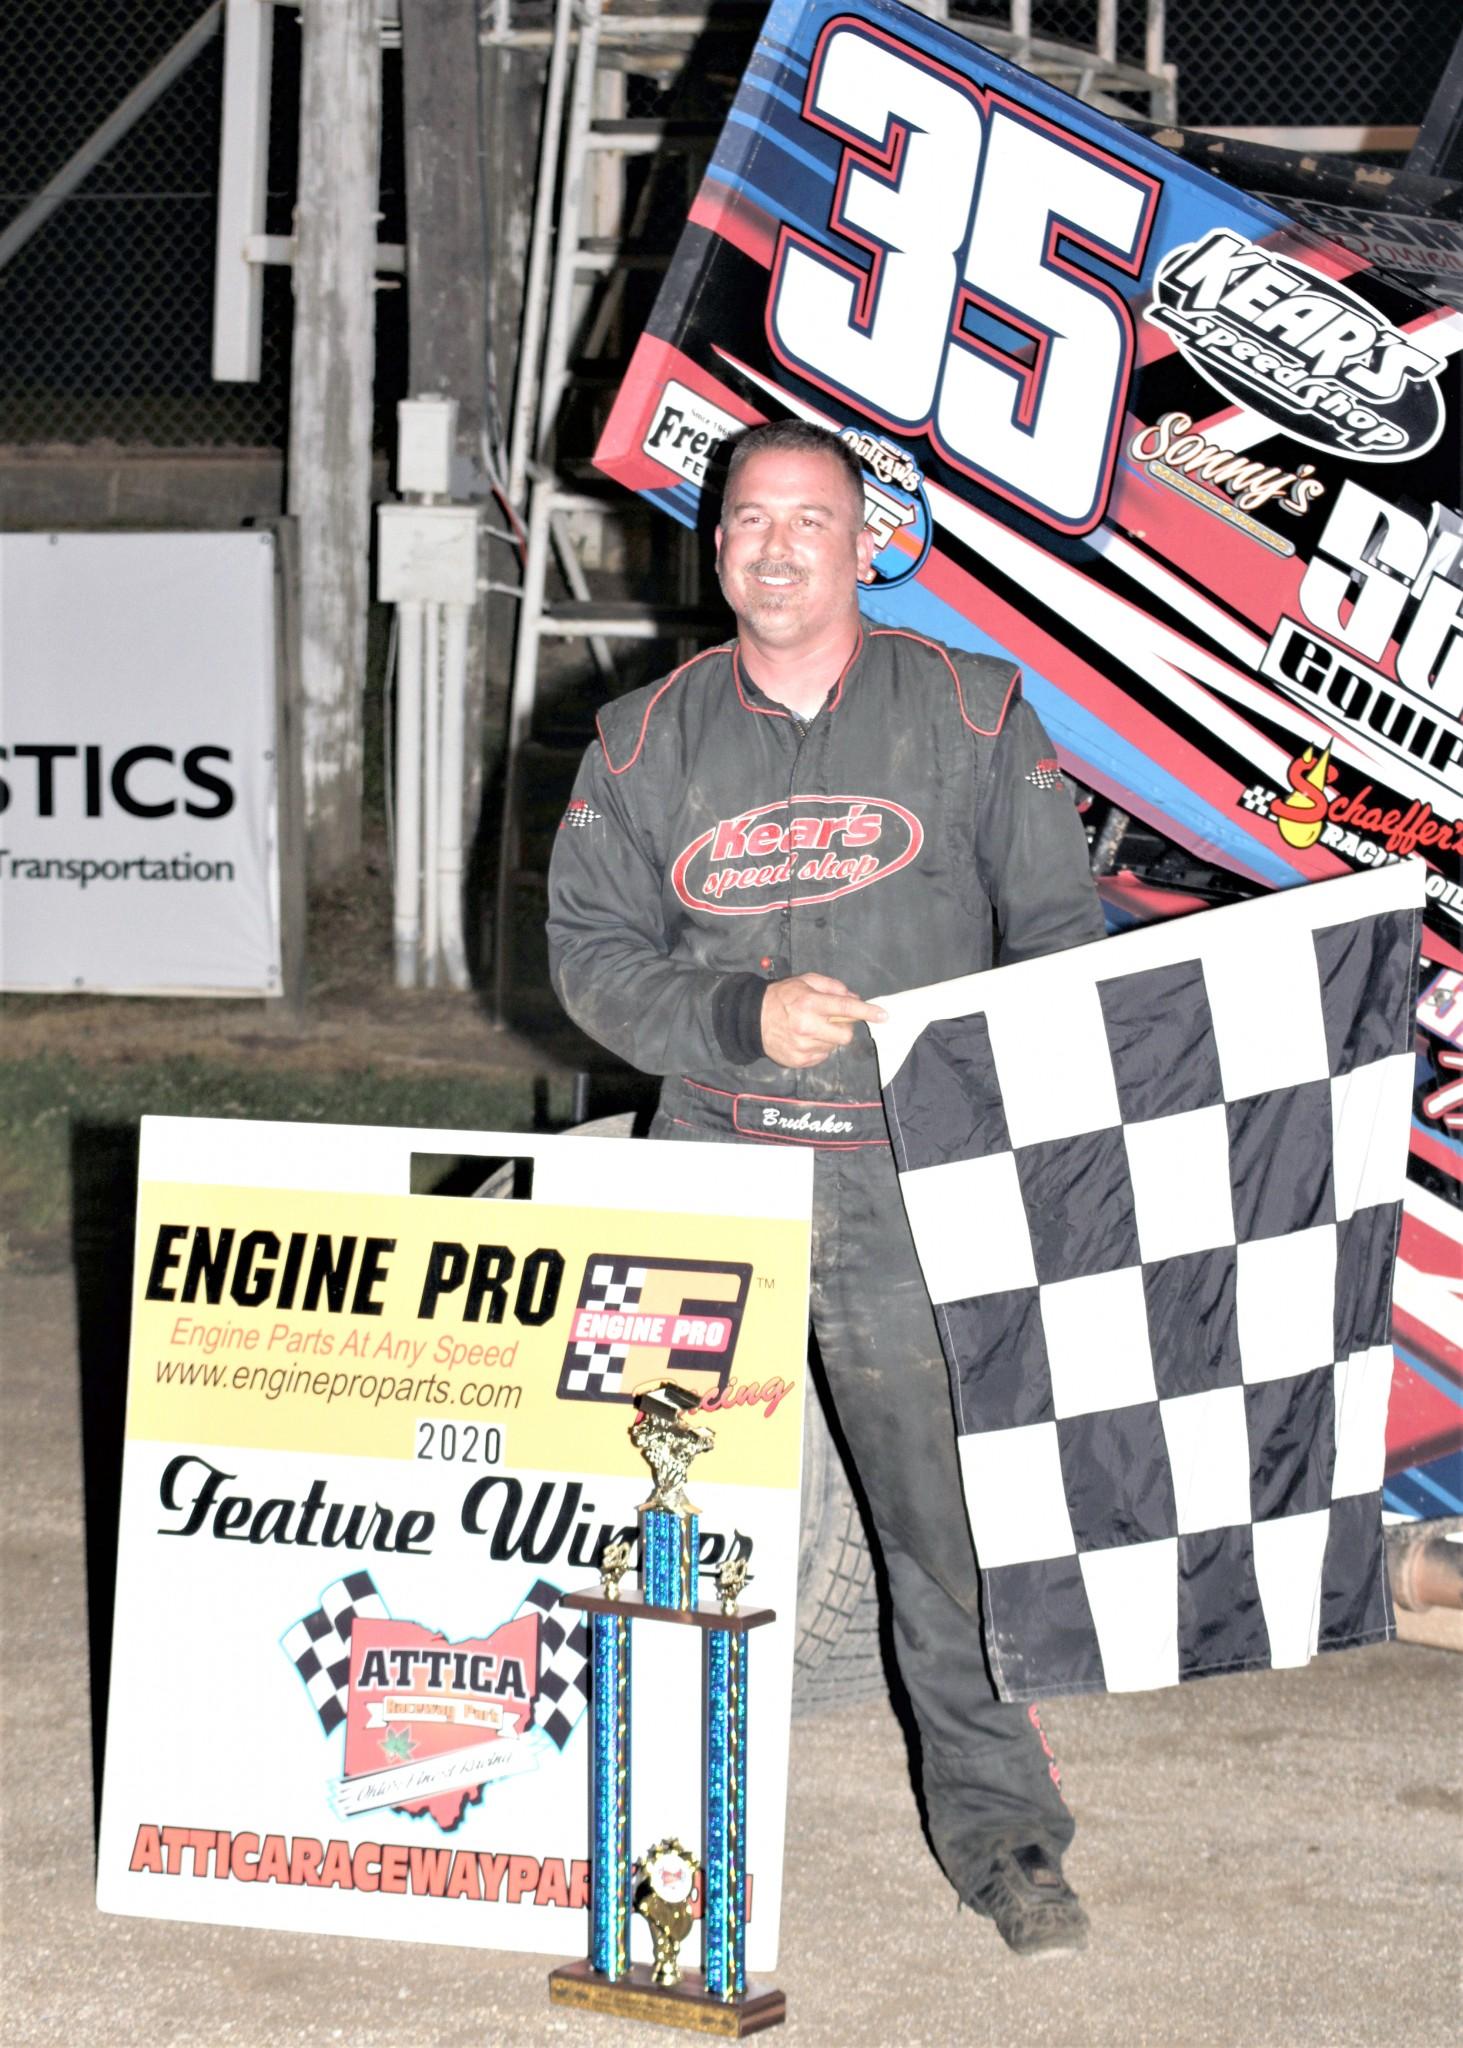 Top 10 finisher Stuart Brubaker, originally from the Helena-Gibsonburg area. (Photo by Rick Sherer)